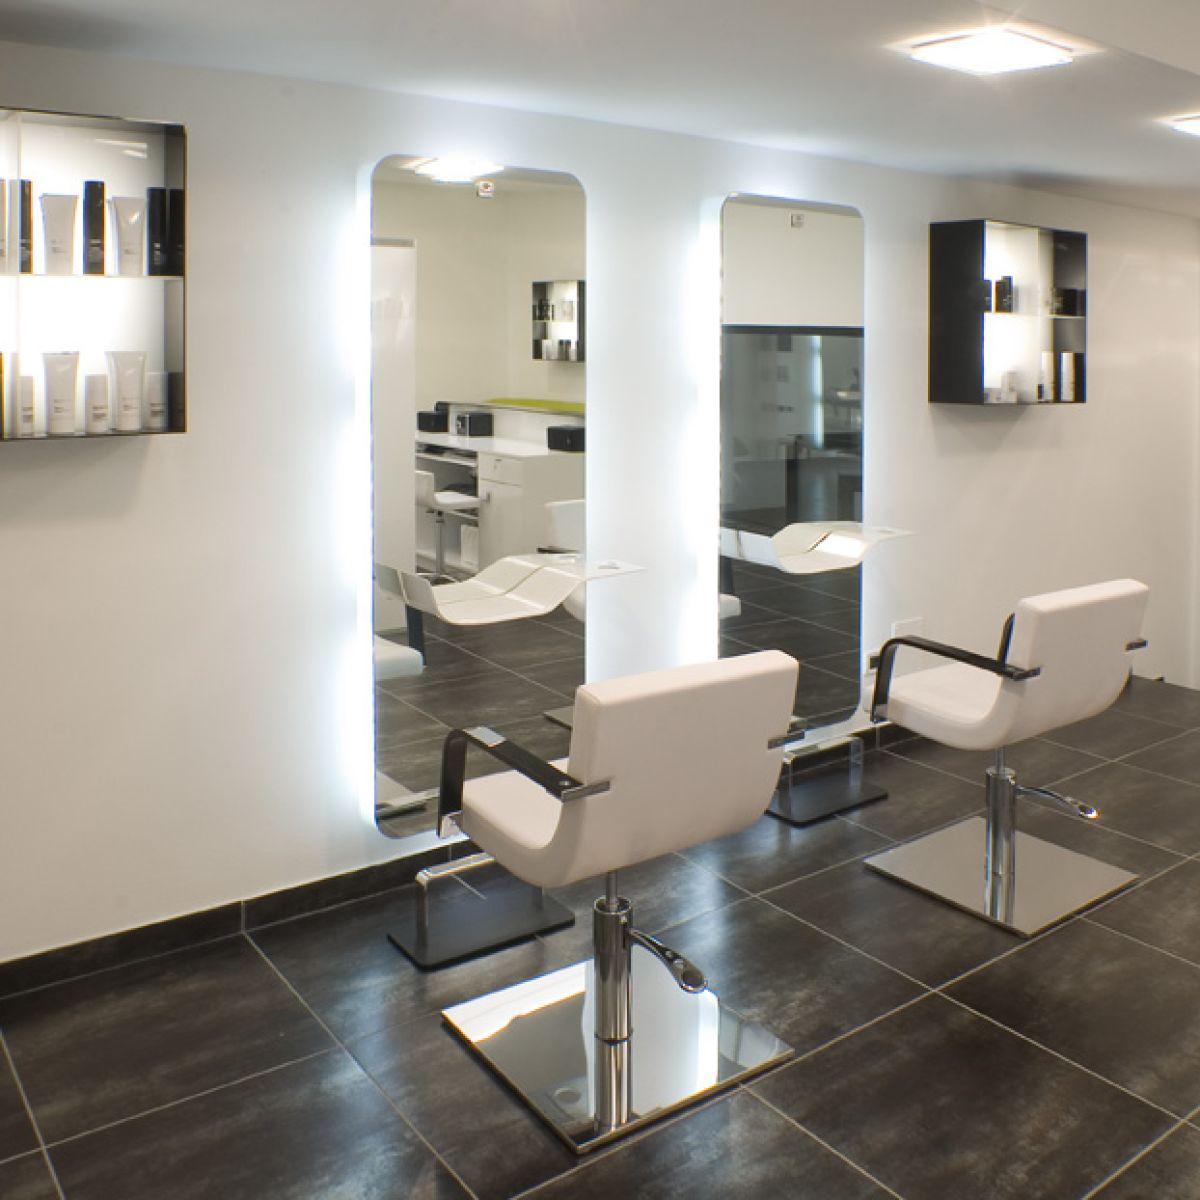 Nelson mobilier produttore mobili per parrucchieri for Lavoro arredatore